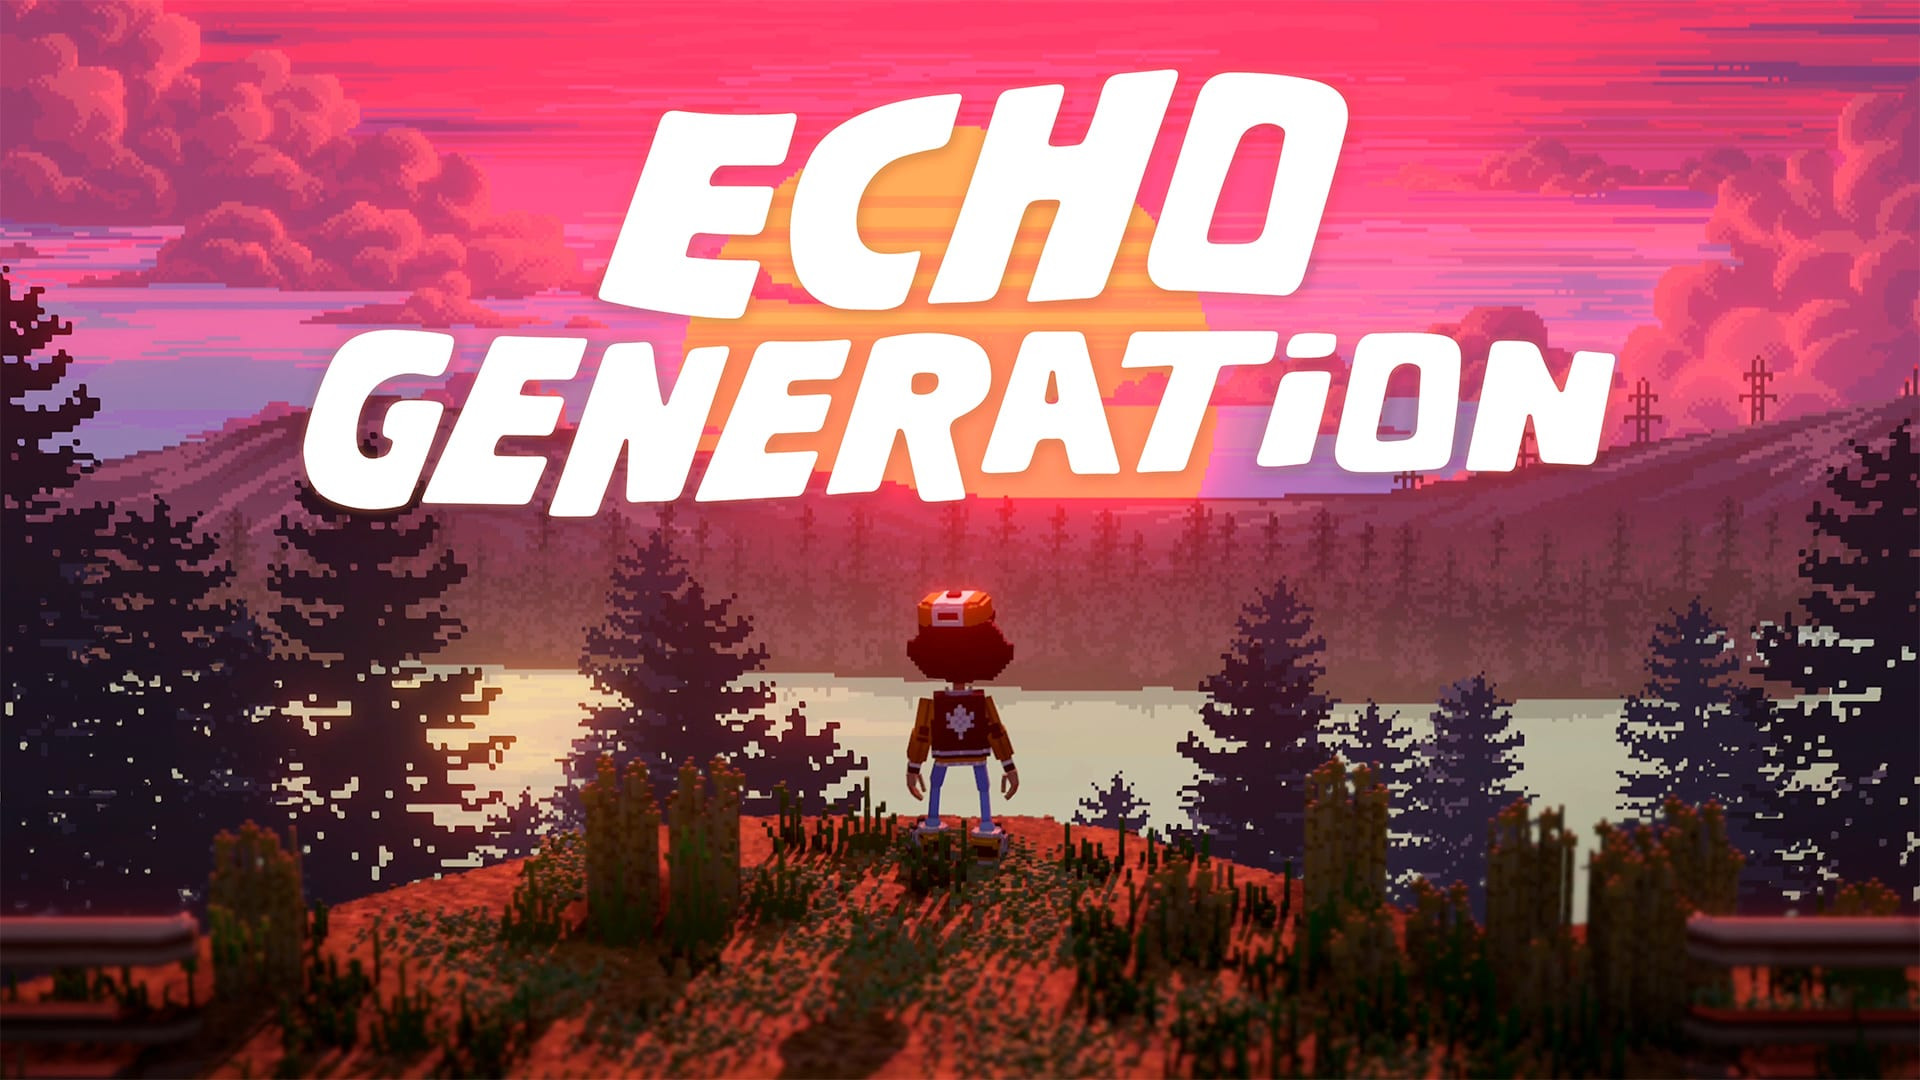 Echo Generation Xbox Games Showcase Pre-Show